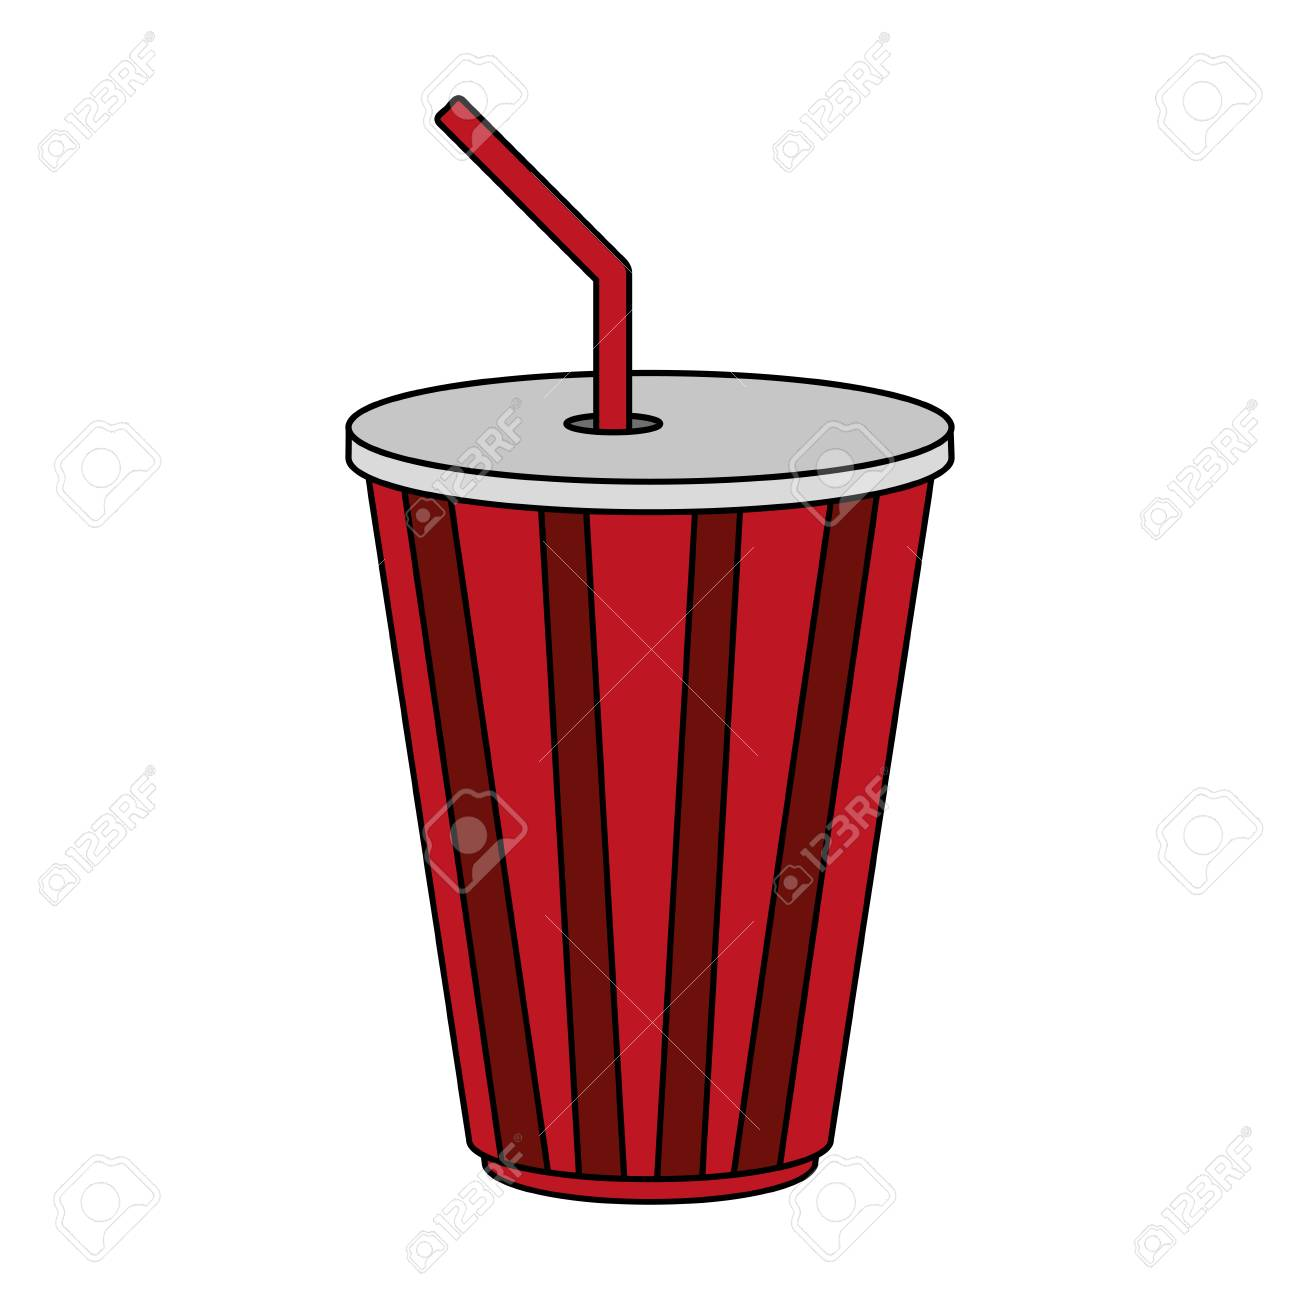 Soda Clipart soda cup 5.